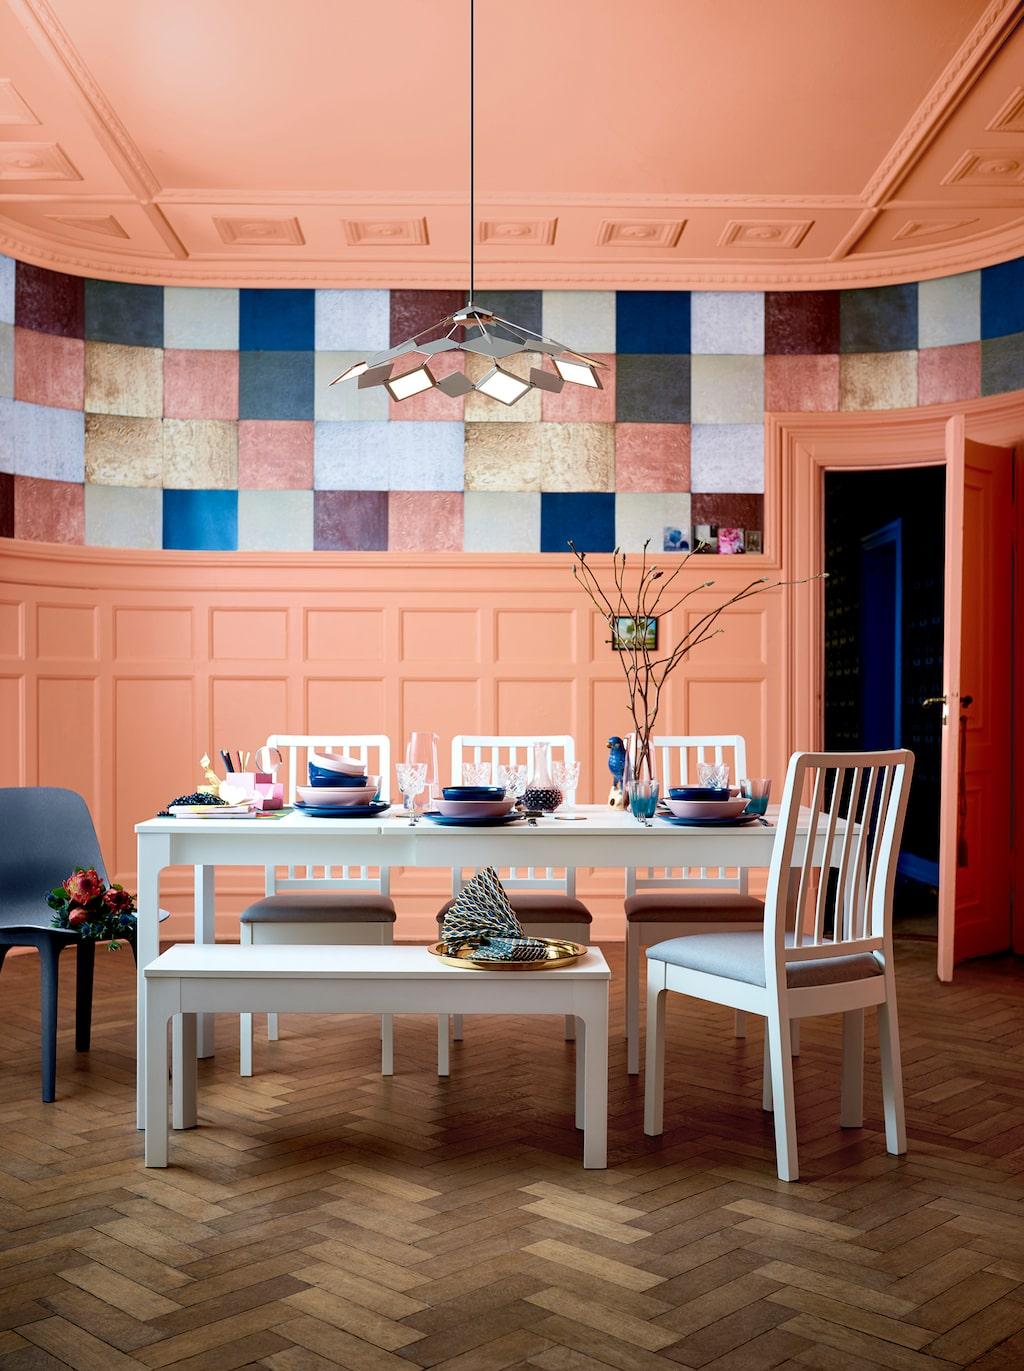 Ekedalen serie. Utdragbart bord, 1795 kronor. Vit.  Stol, 425 kronor styck. Vit.  Bänk, 799 kronor. Vit.